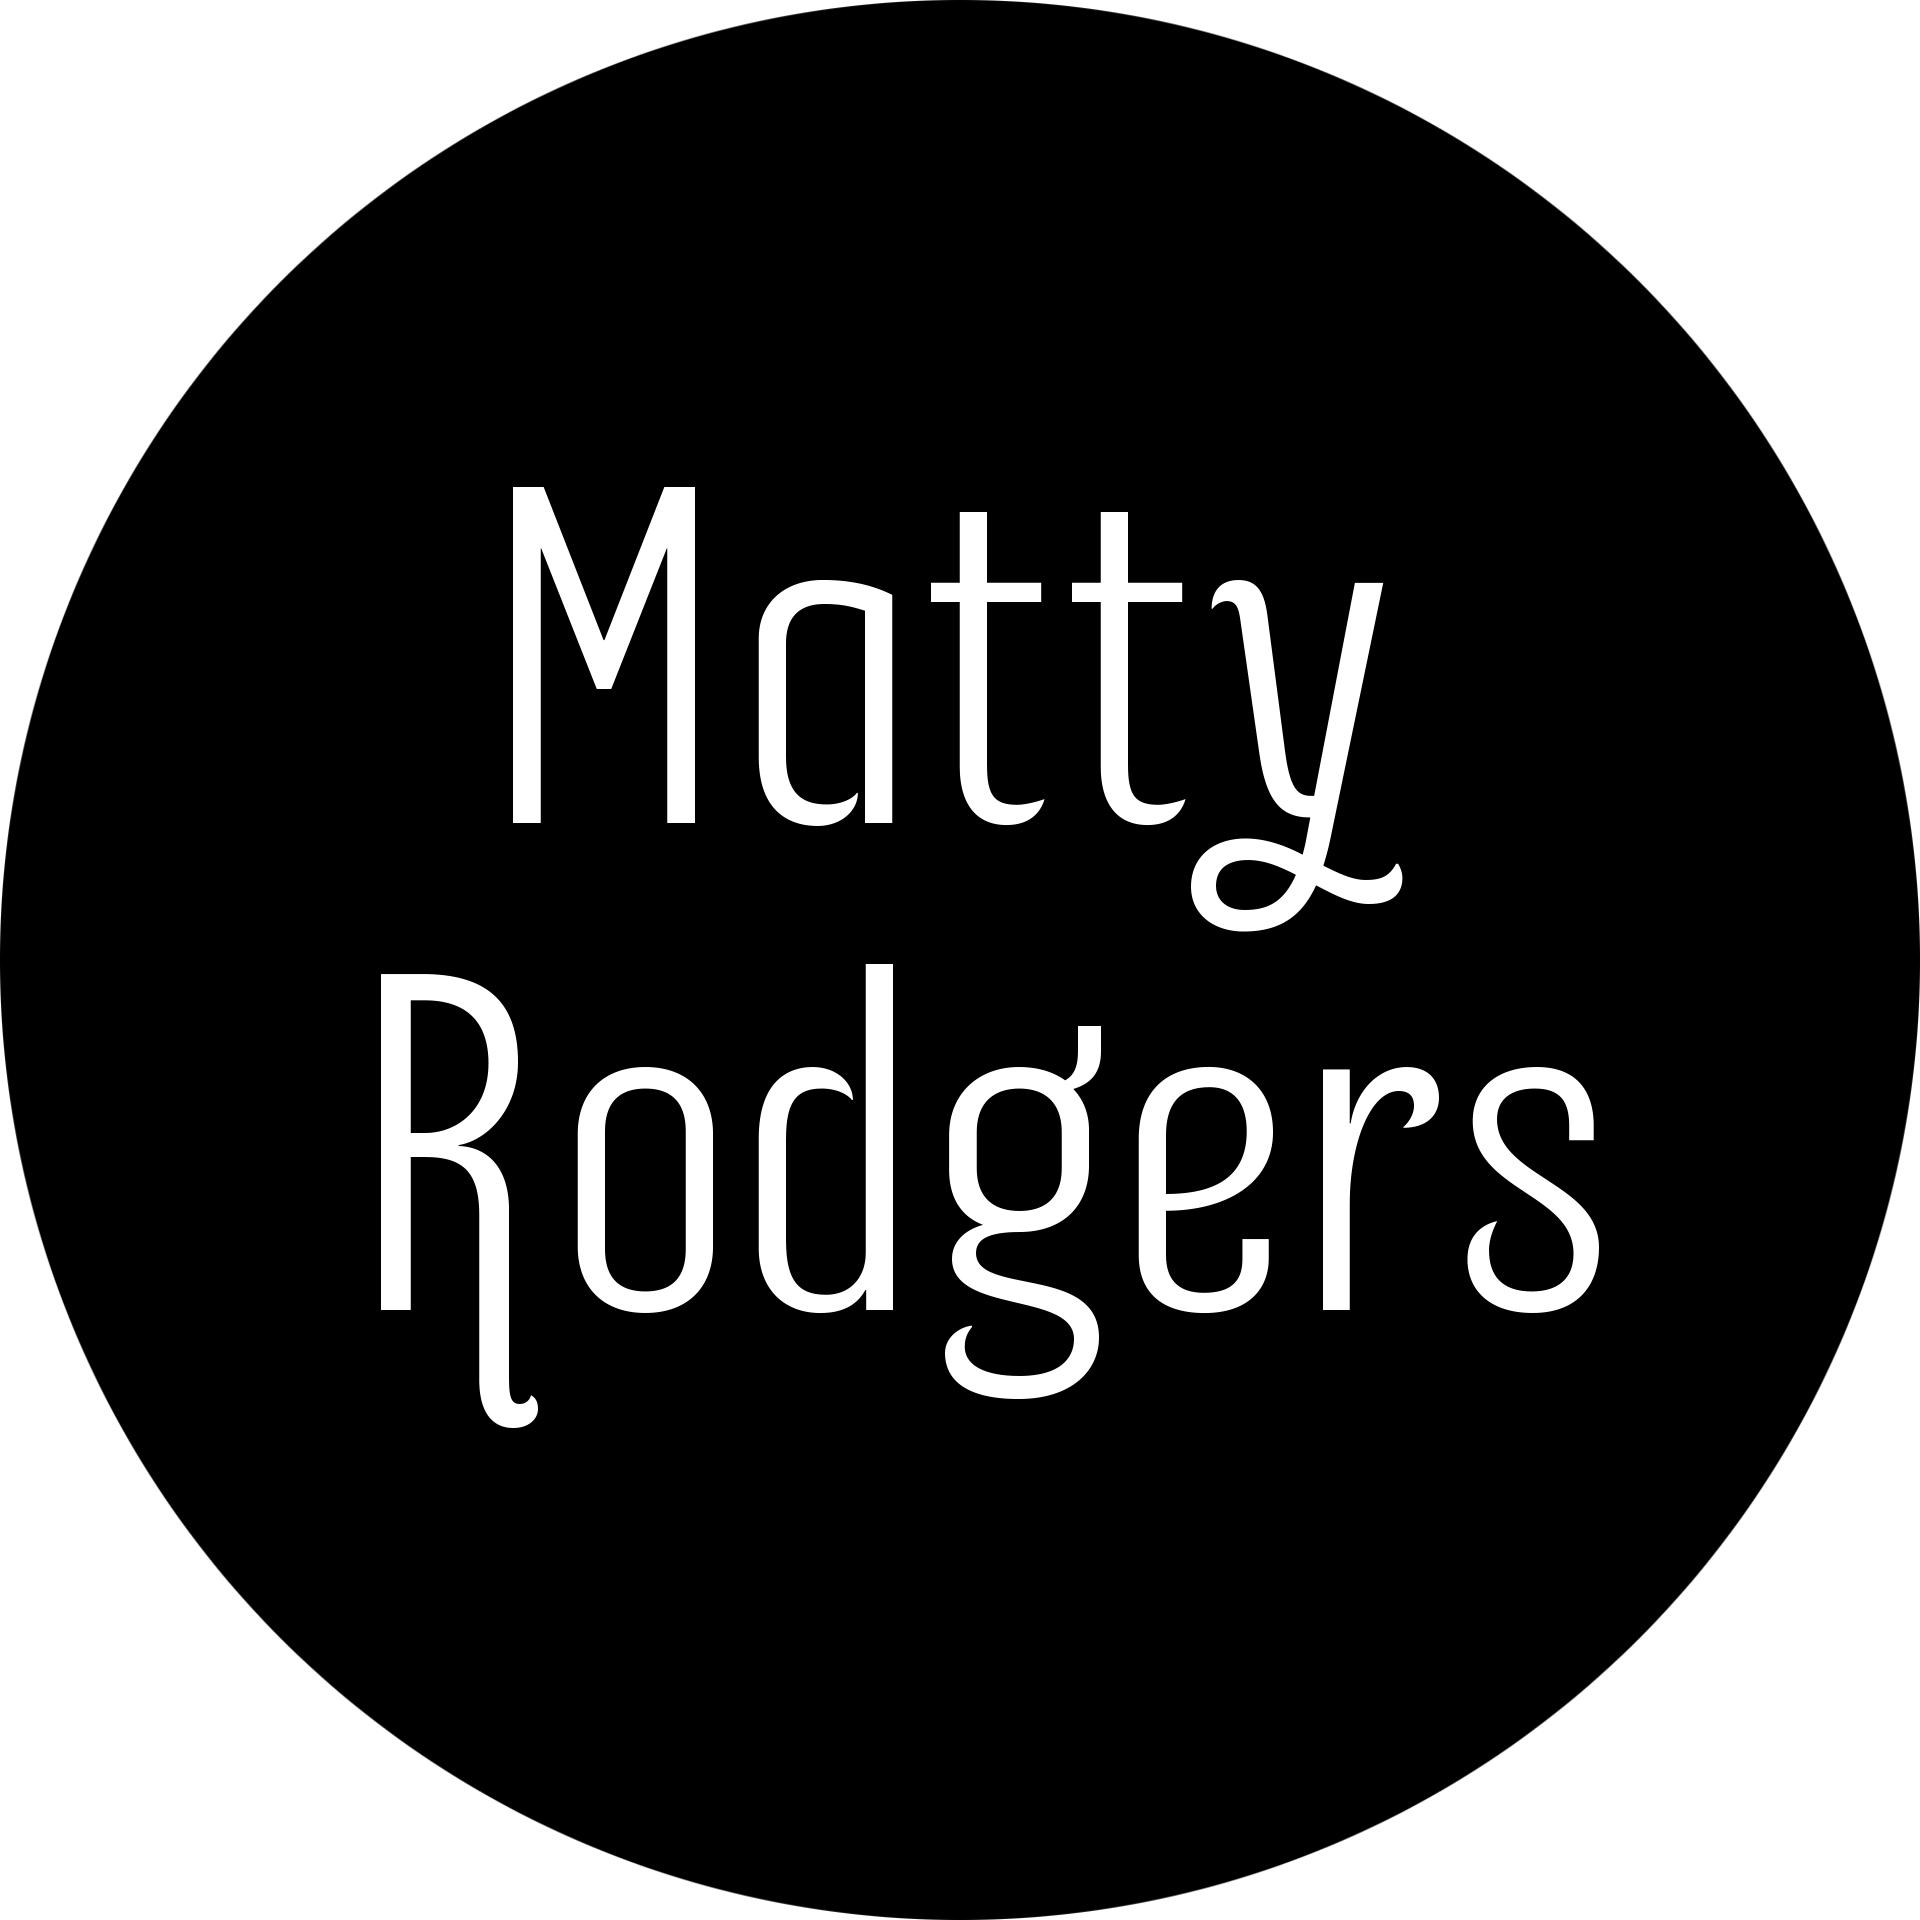 Matthew Rodgers